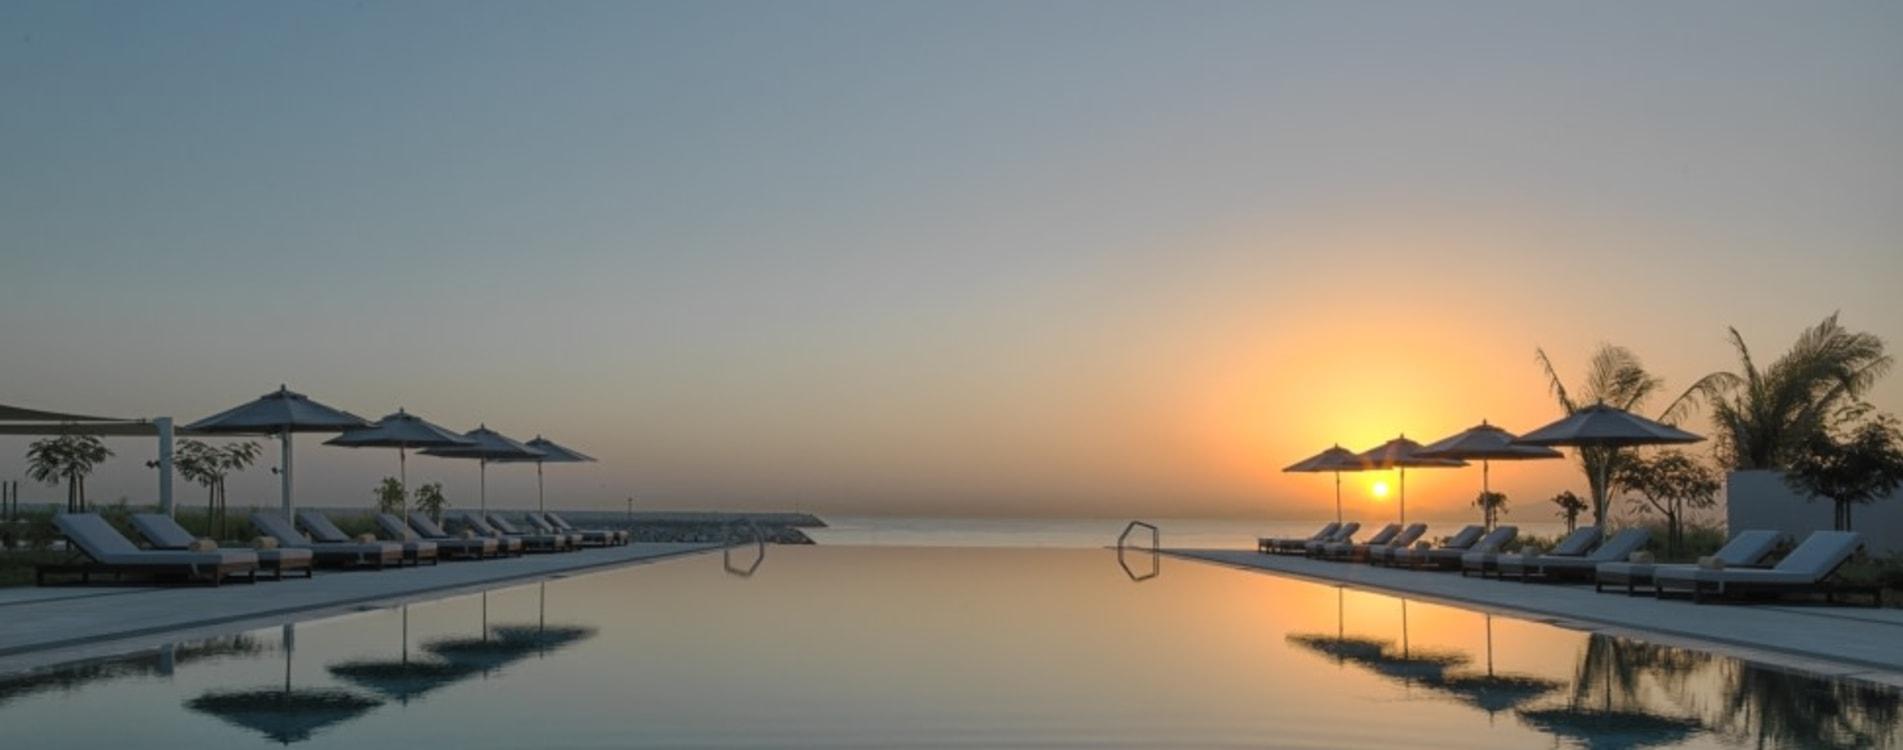 Kempinski-Hotel-Muscat-Exterior-Pool-Oman.jpg